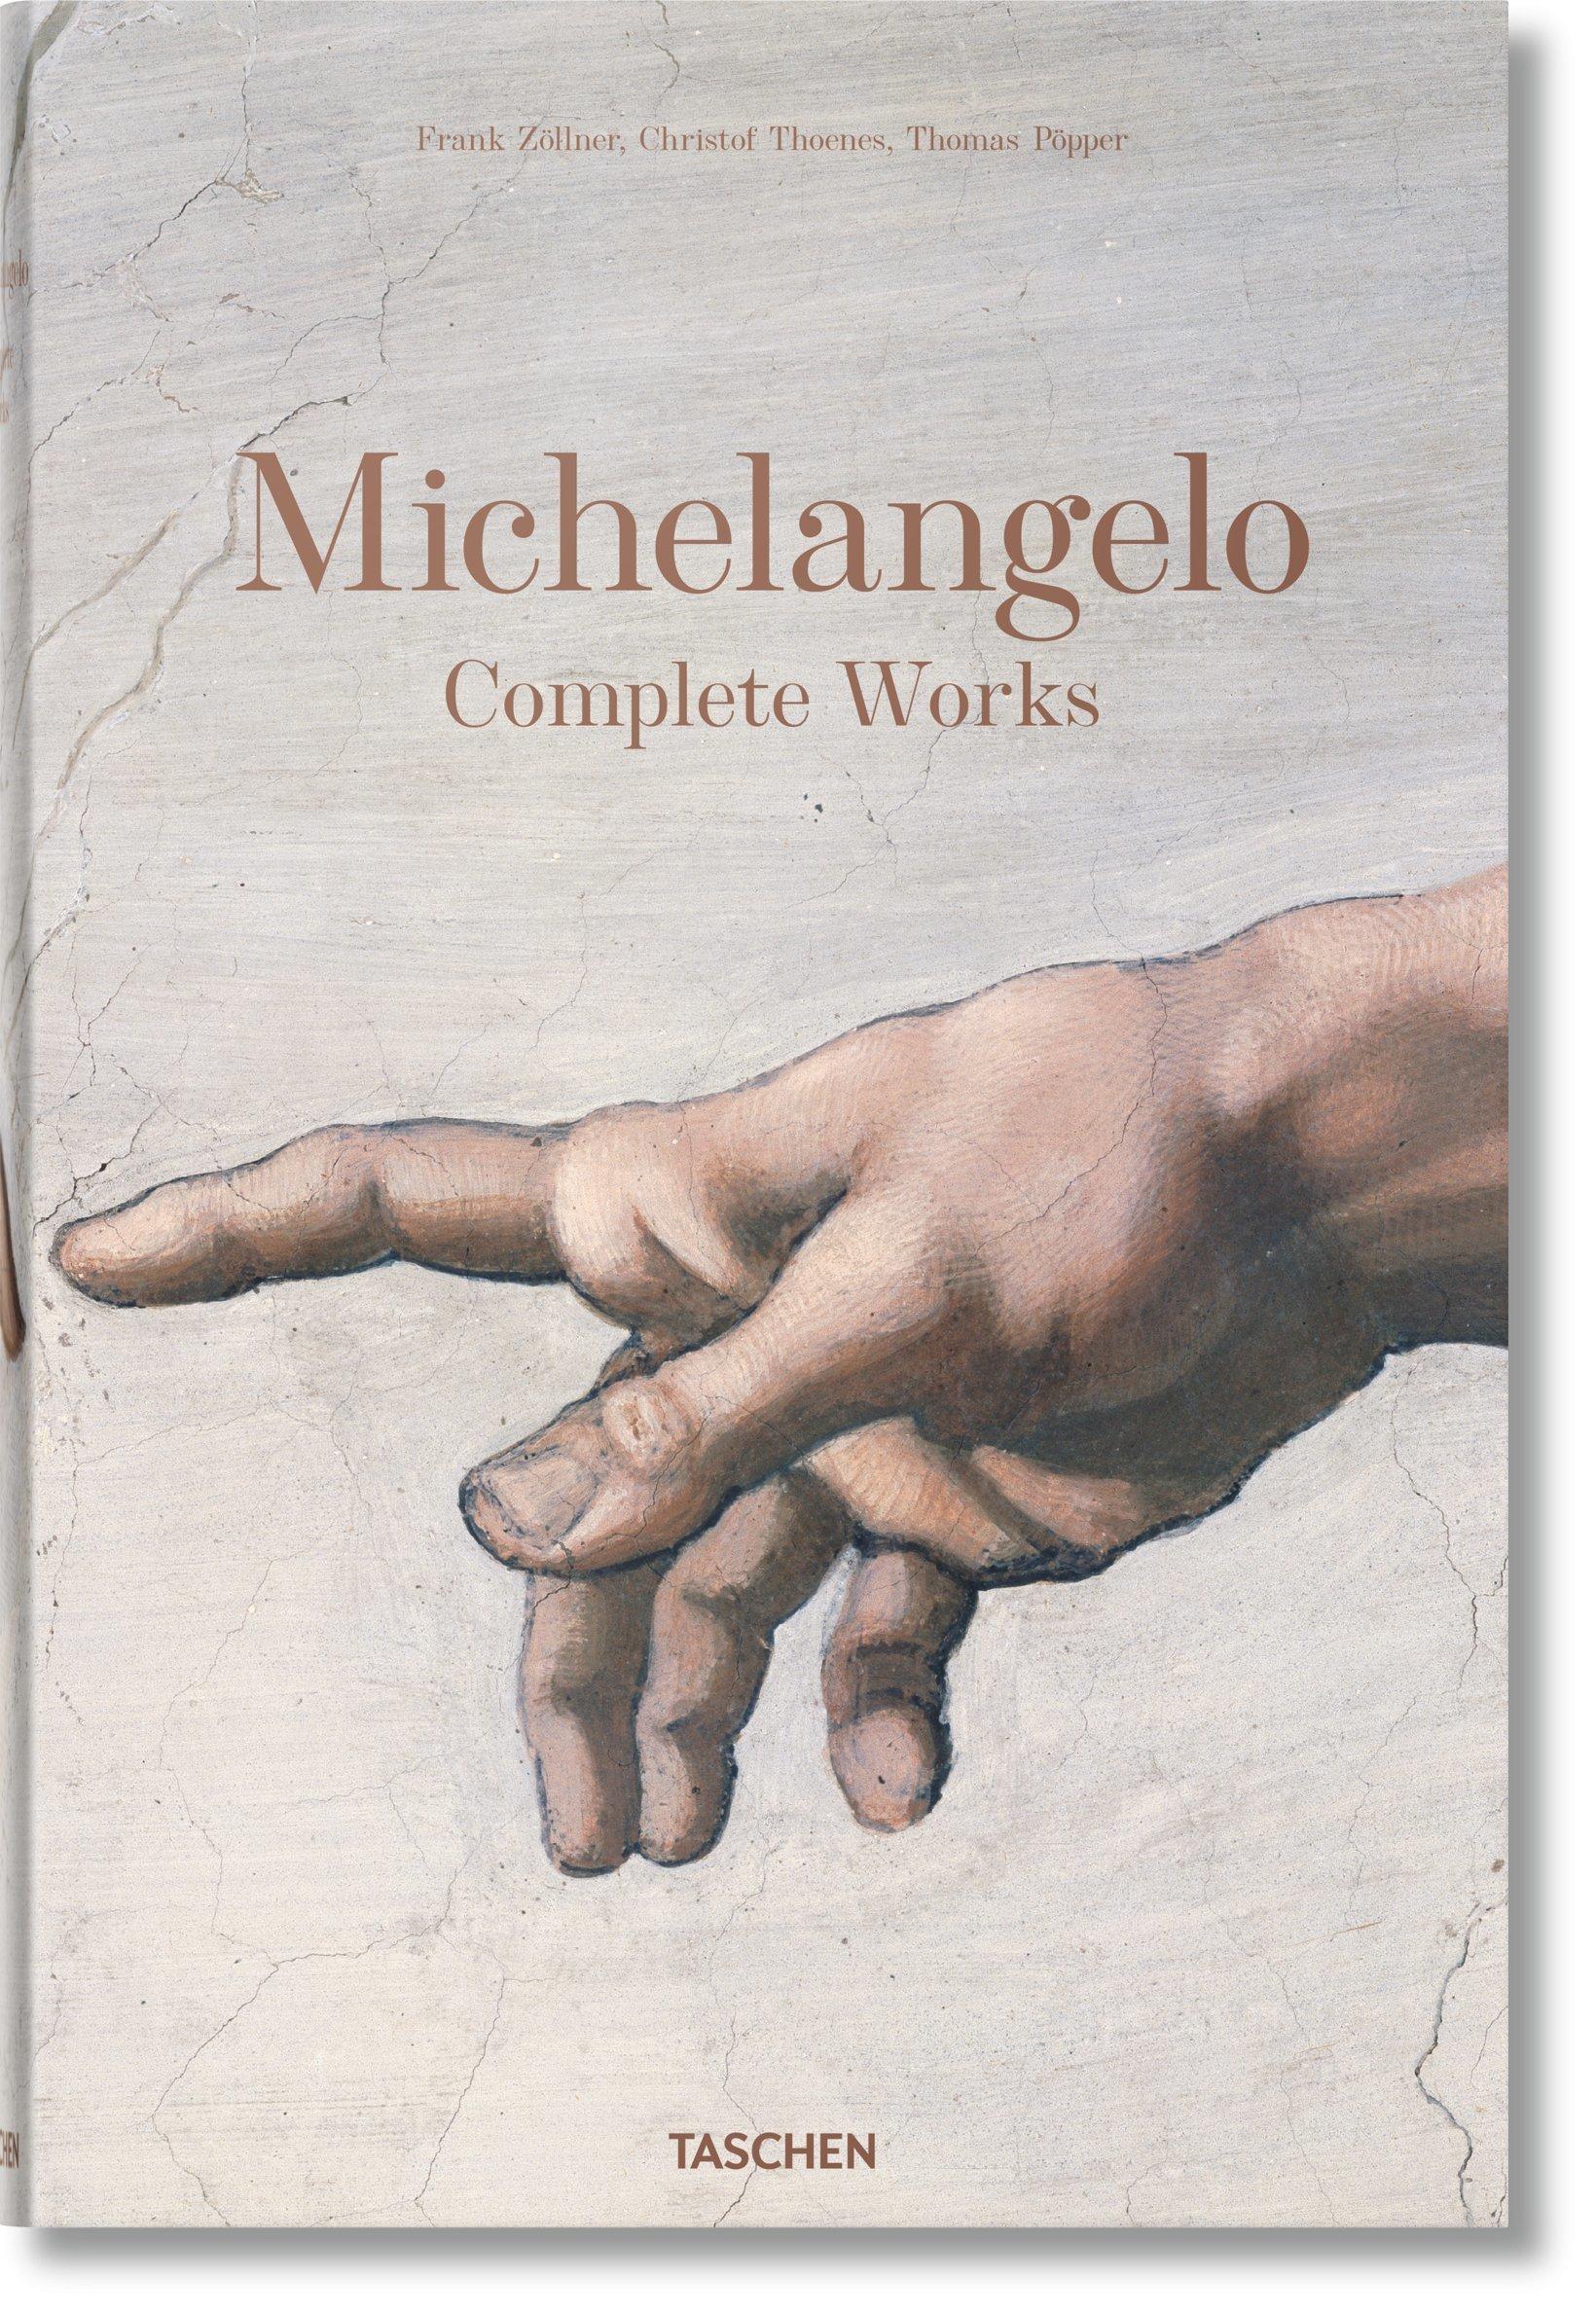 life of michelangelo 2 volumes complete